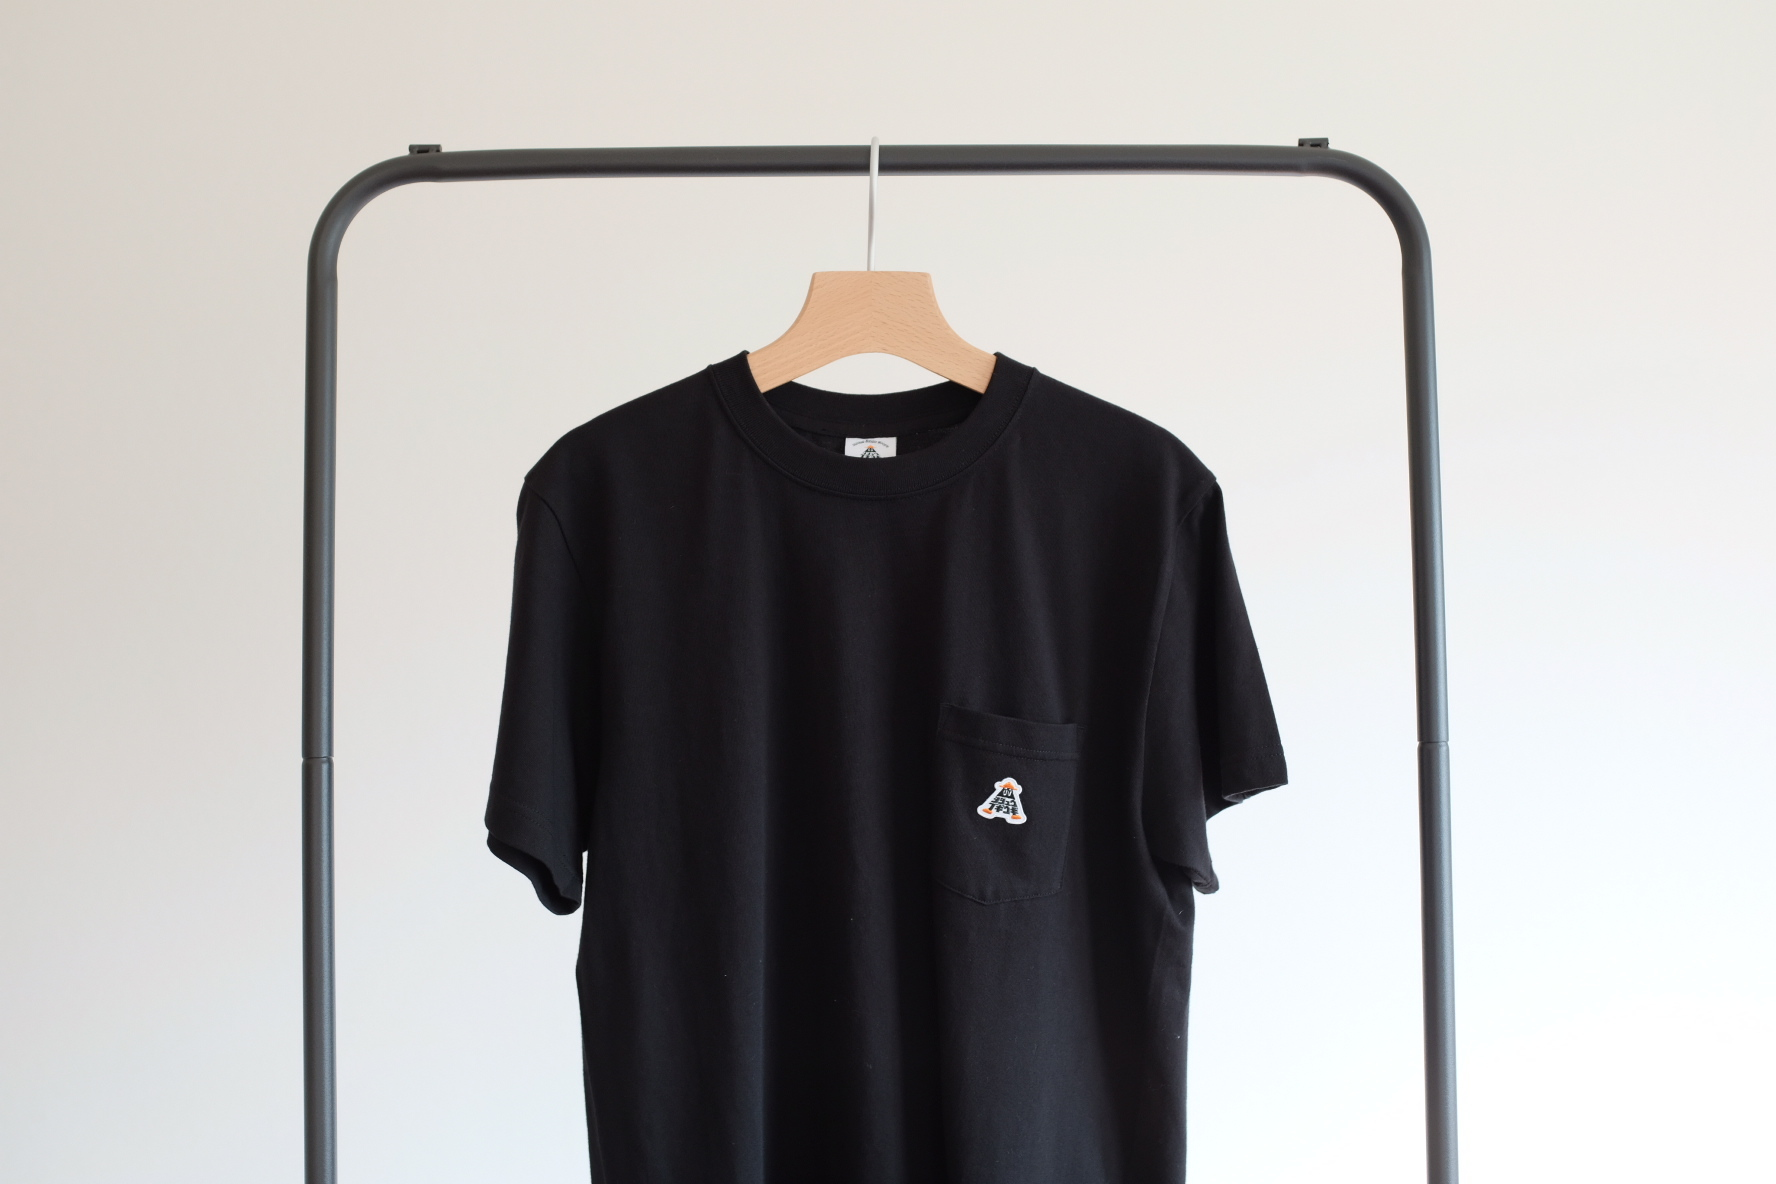 SBW Pocket tee[Black]